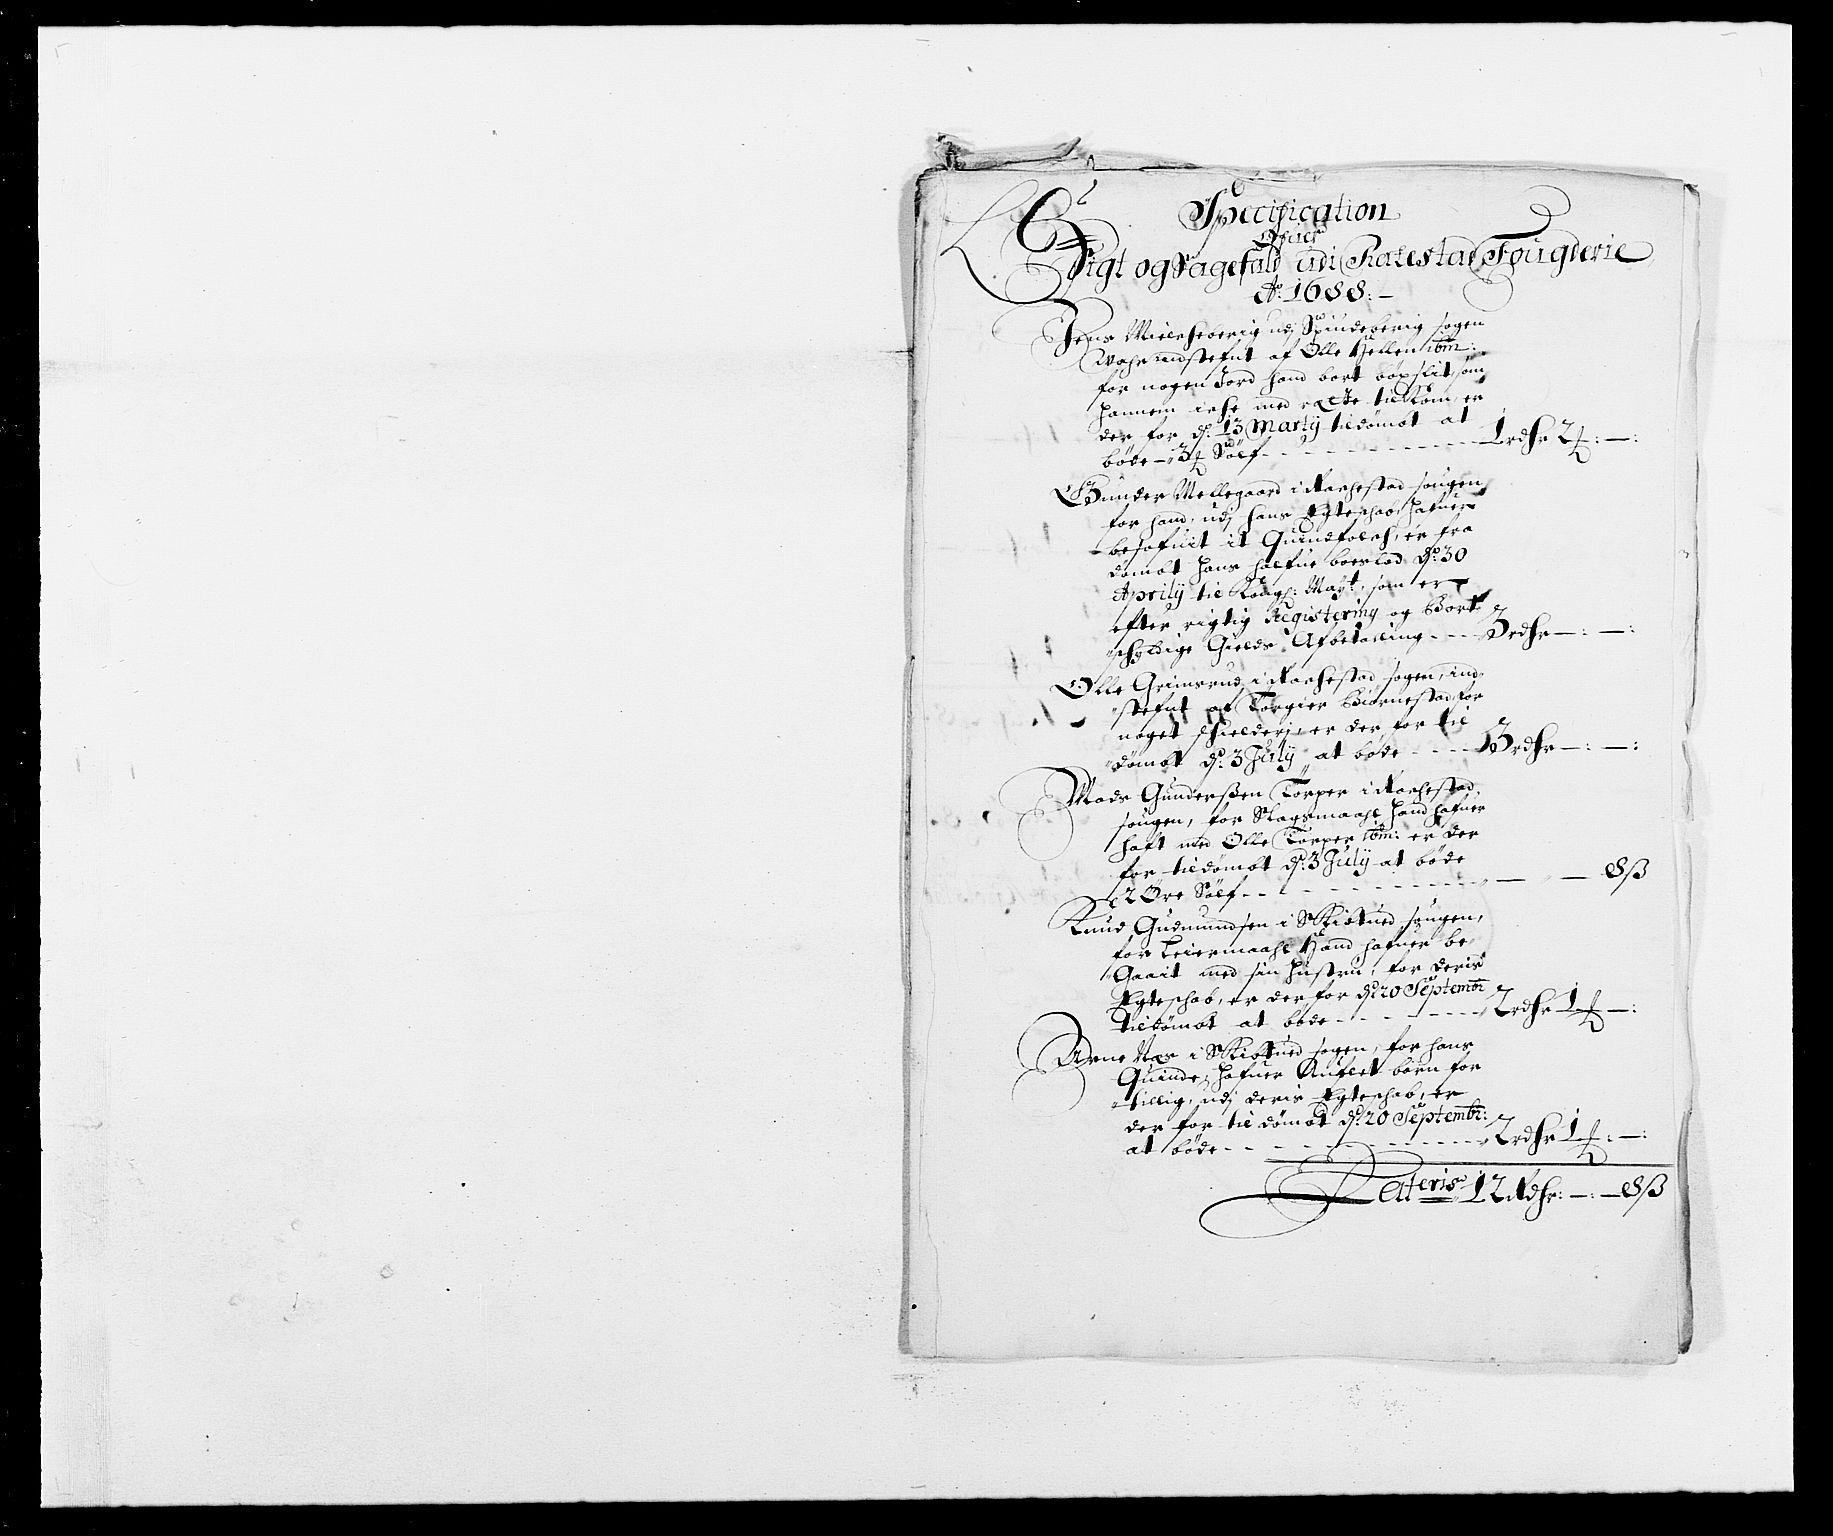 RA, Rentekammeret inntil 1814, Reviderte regnskaper, Fogderegnskap, R05/L0276: Fogderegnskap Rakkestad, 1683-1688, s. 139